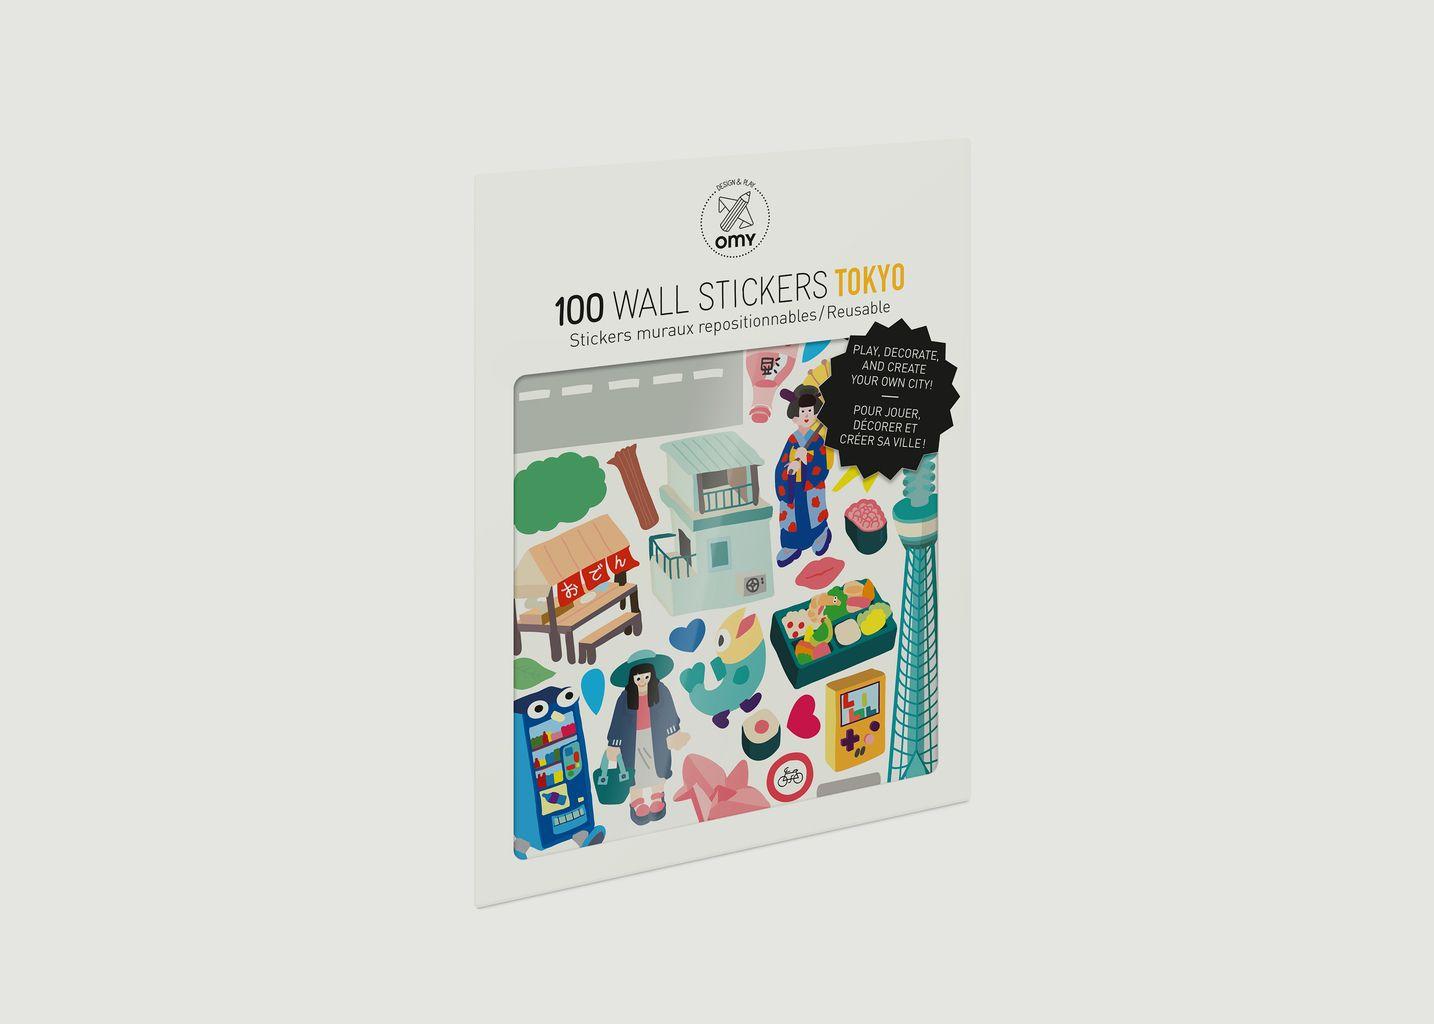 Stickers Tokyo - Omy